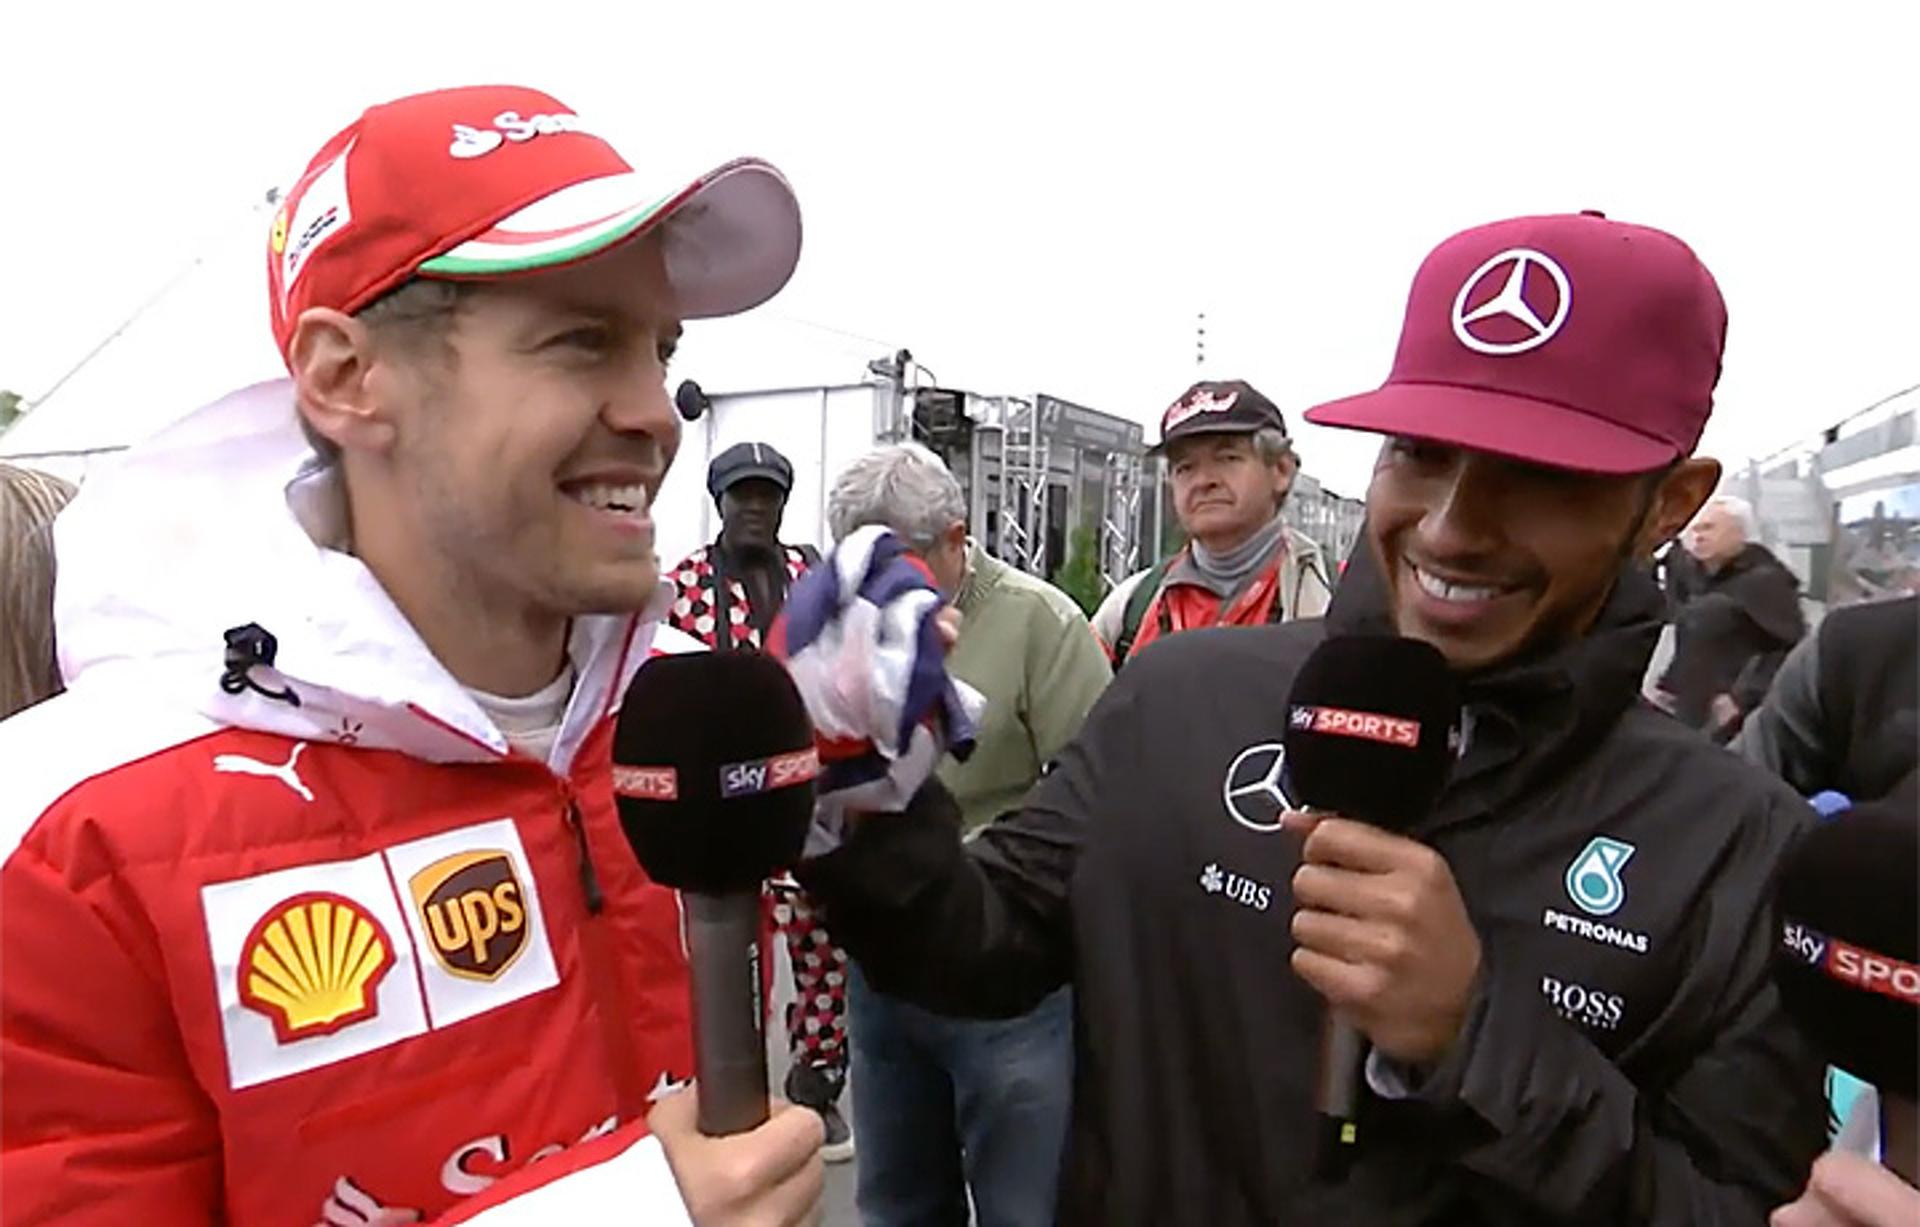 Seagulls Cost Sebastian Vettel a Ferrari F1 Win in Canada